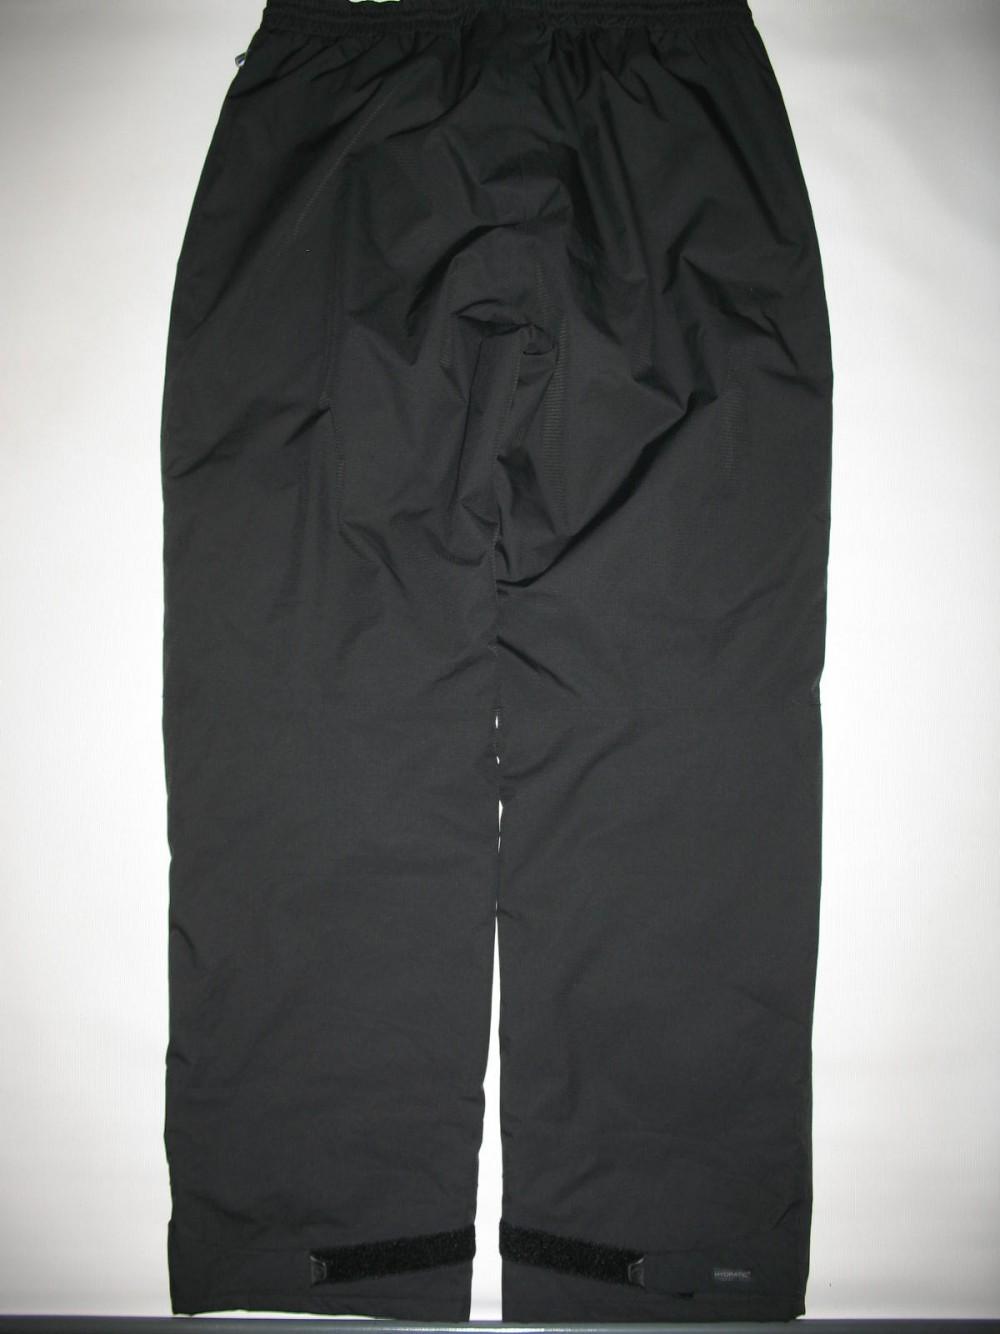 Штаны FJALLRAVEN element pants (размер XL/XXL) - 2